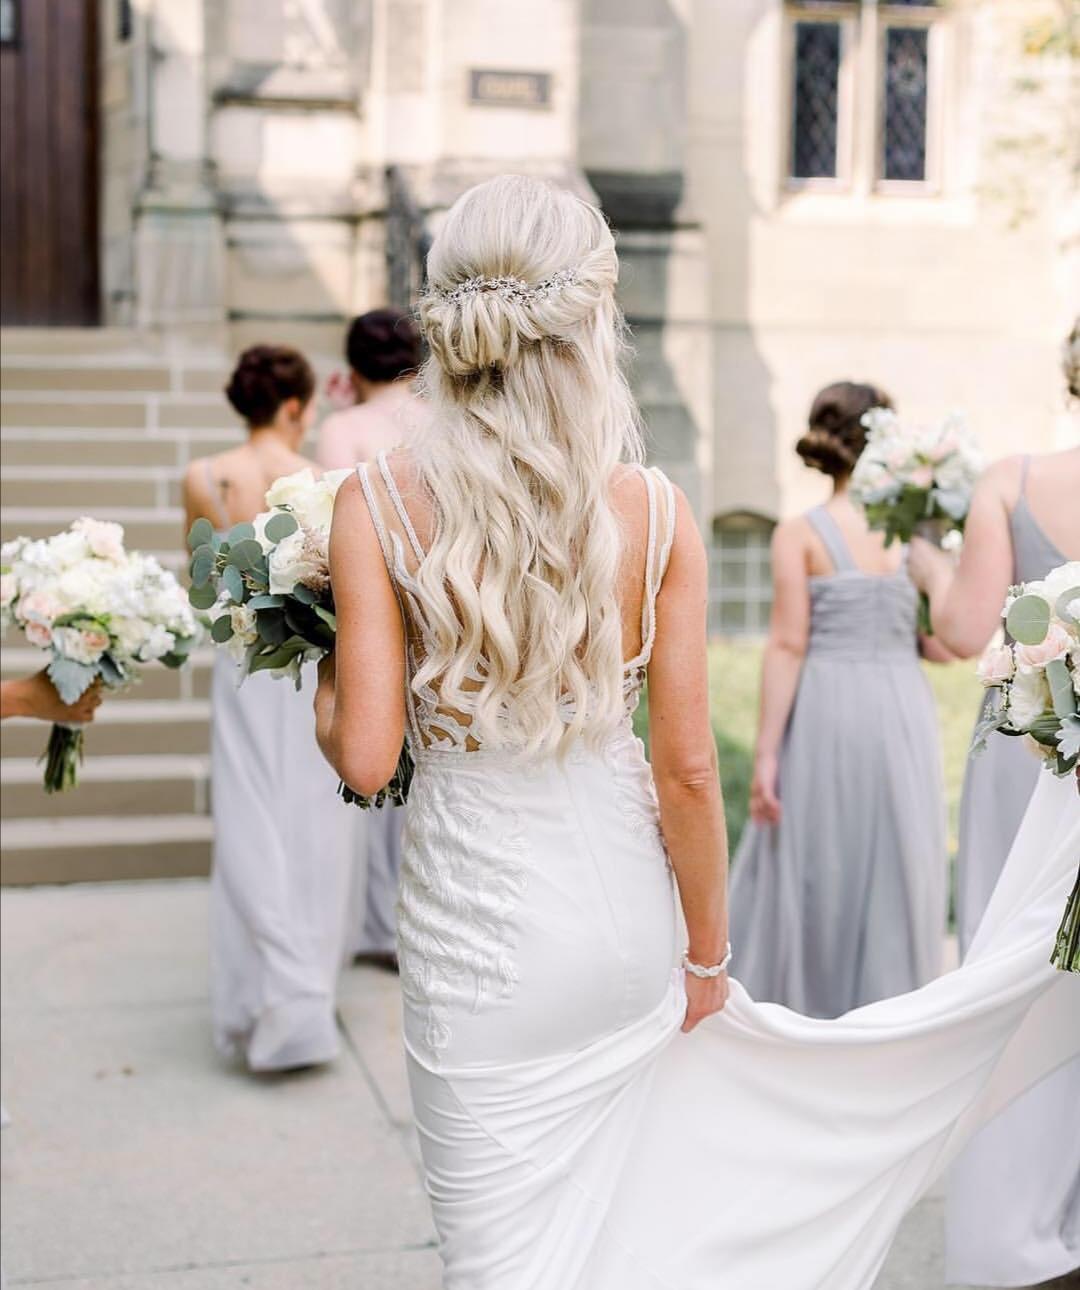 Halfup wedding hairstyles